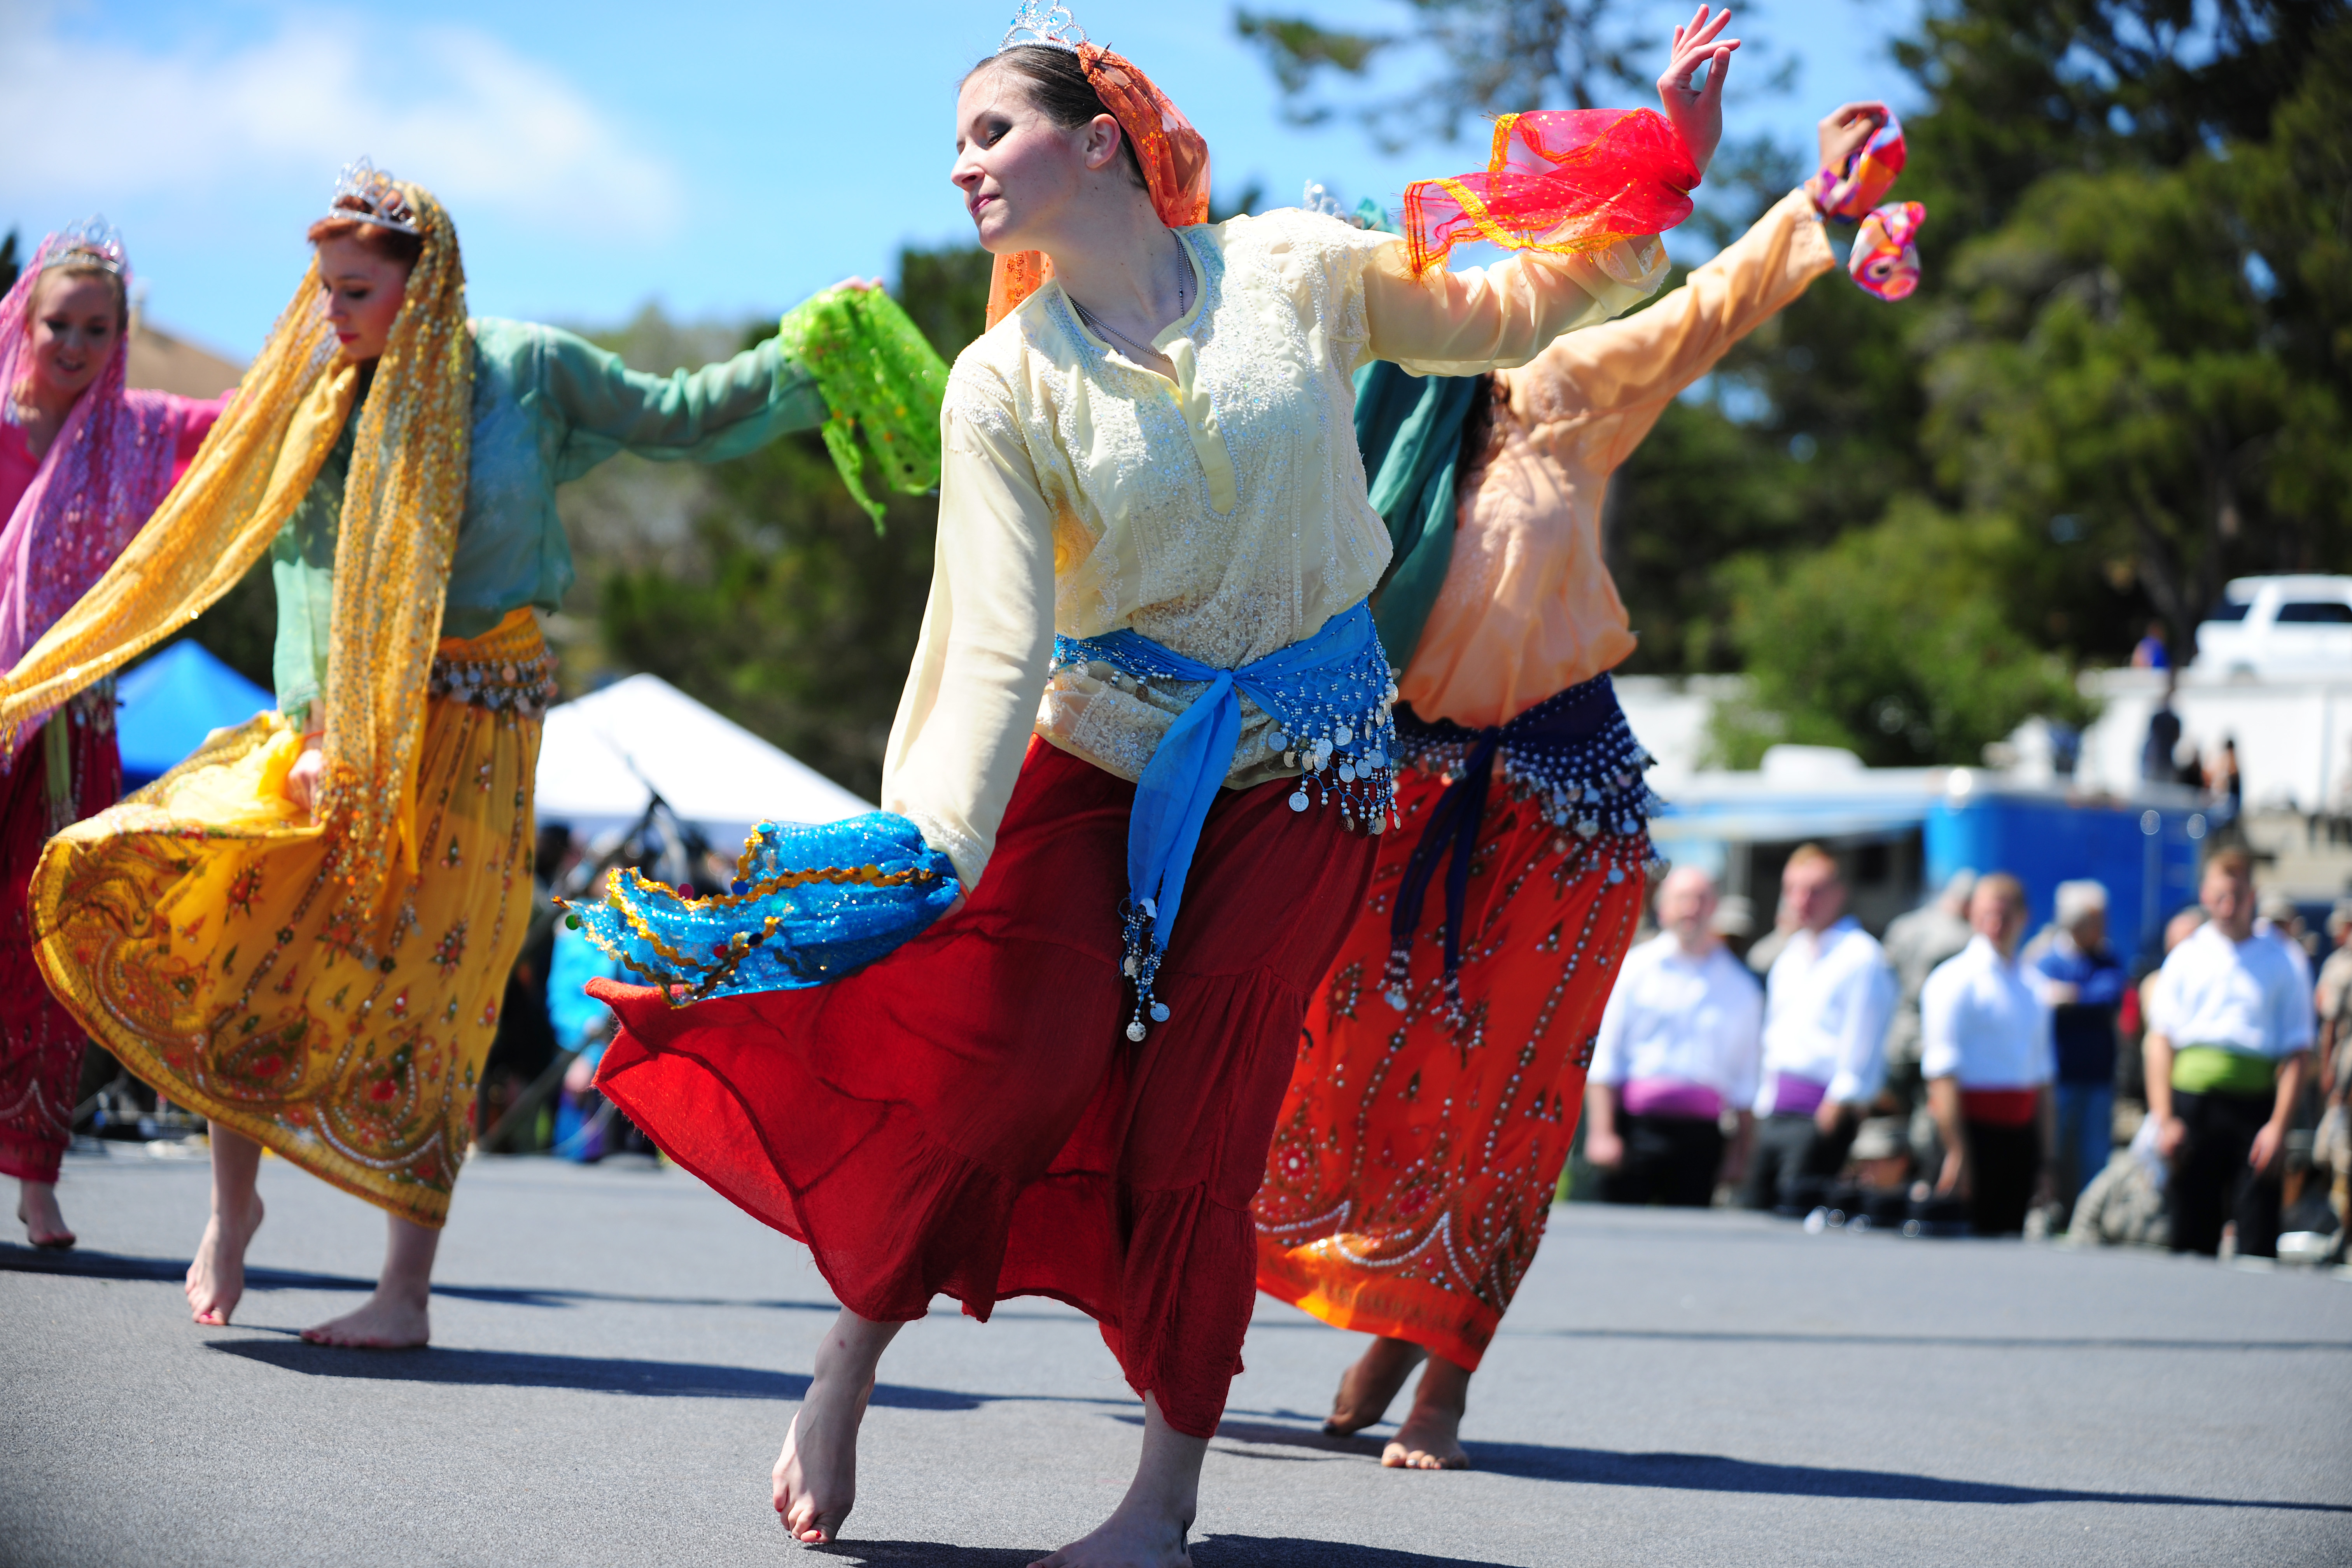 Photo by Presidio of Monterey via Flickr